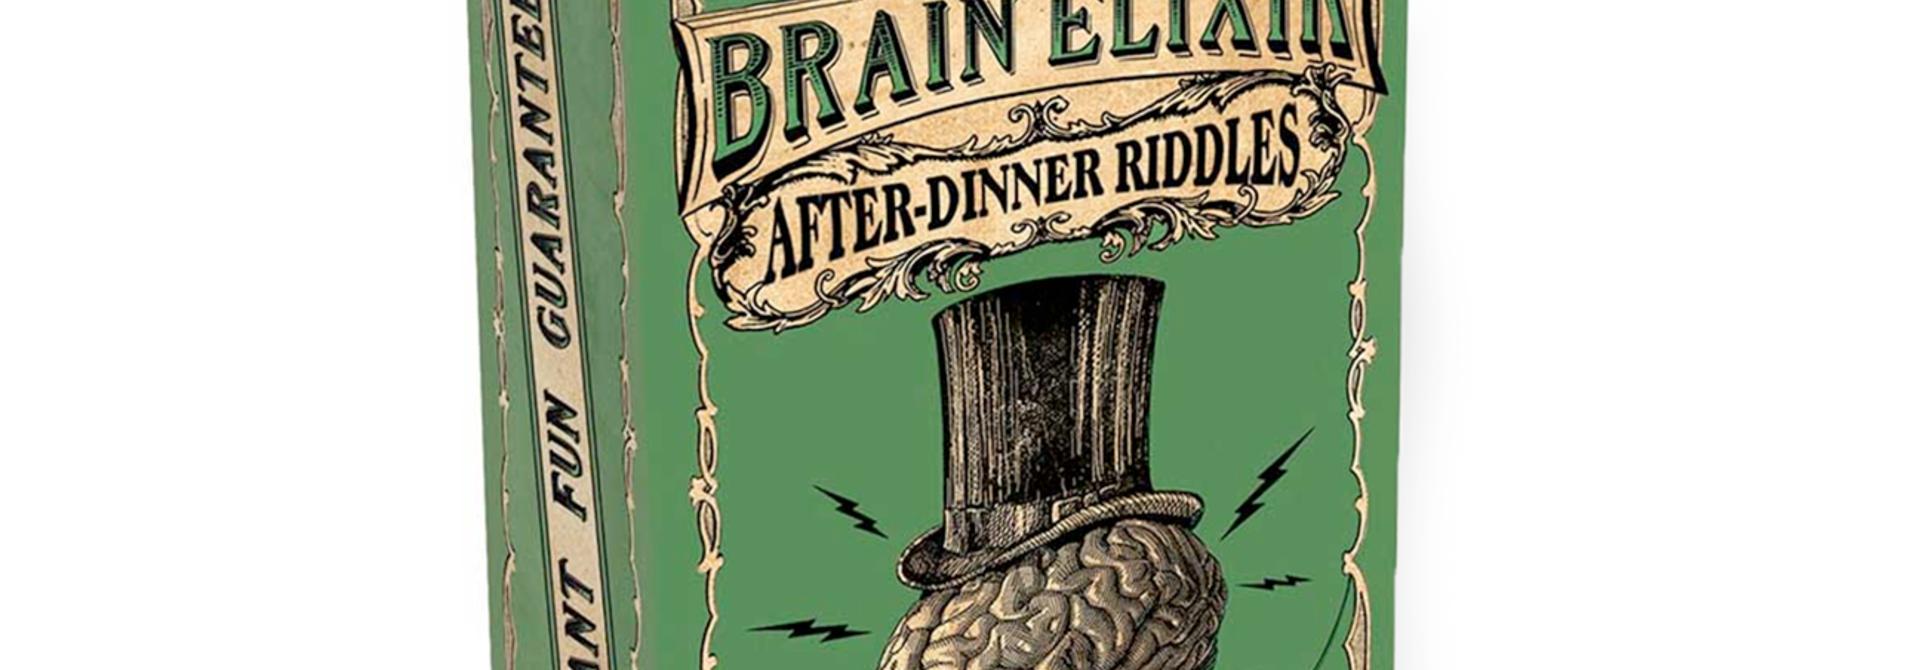 Clarendon's Brain Elixer